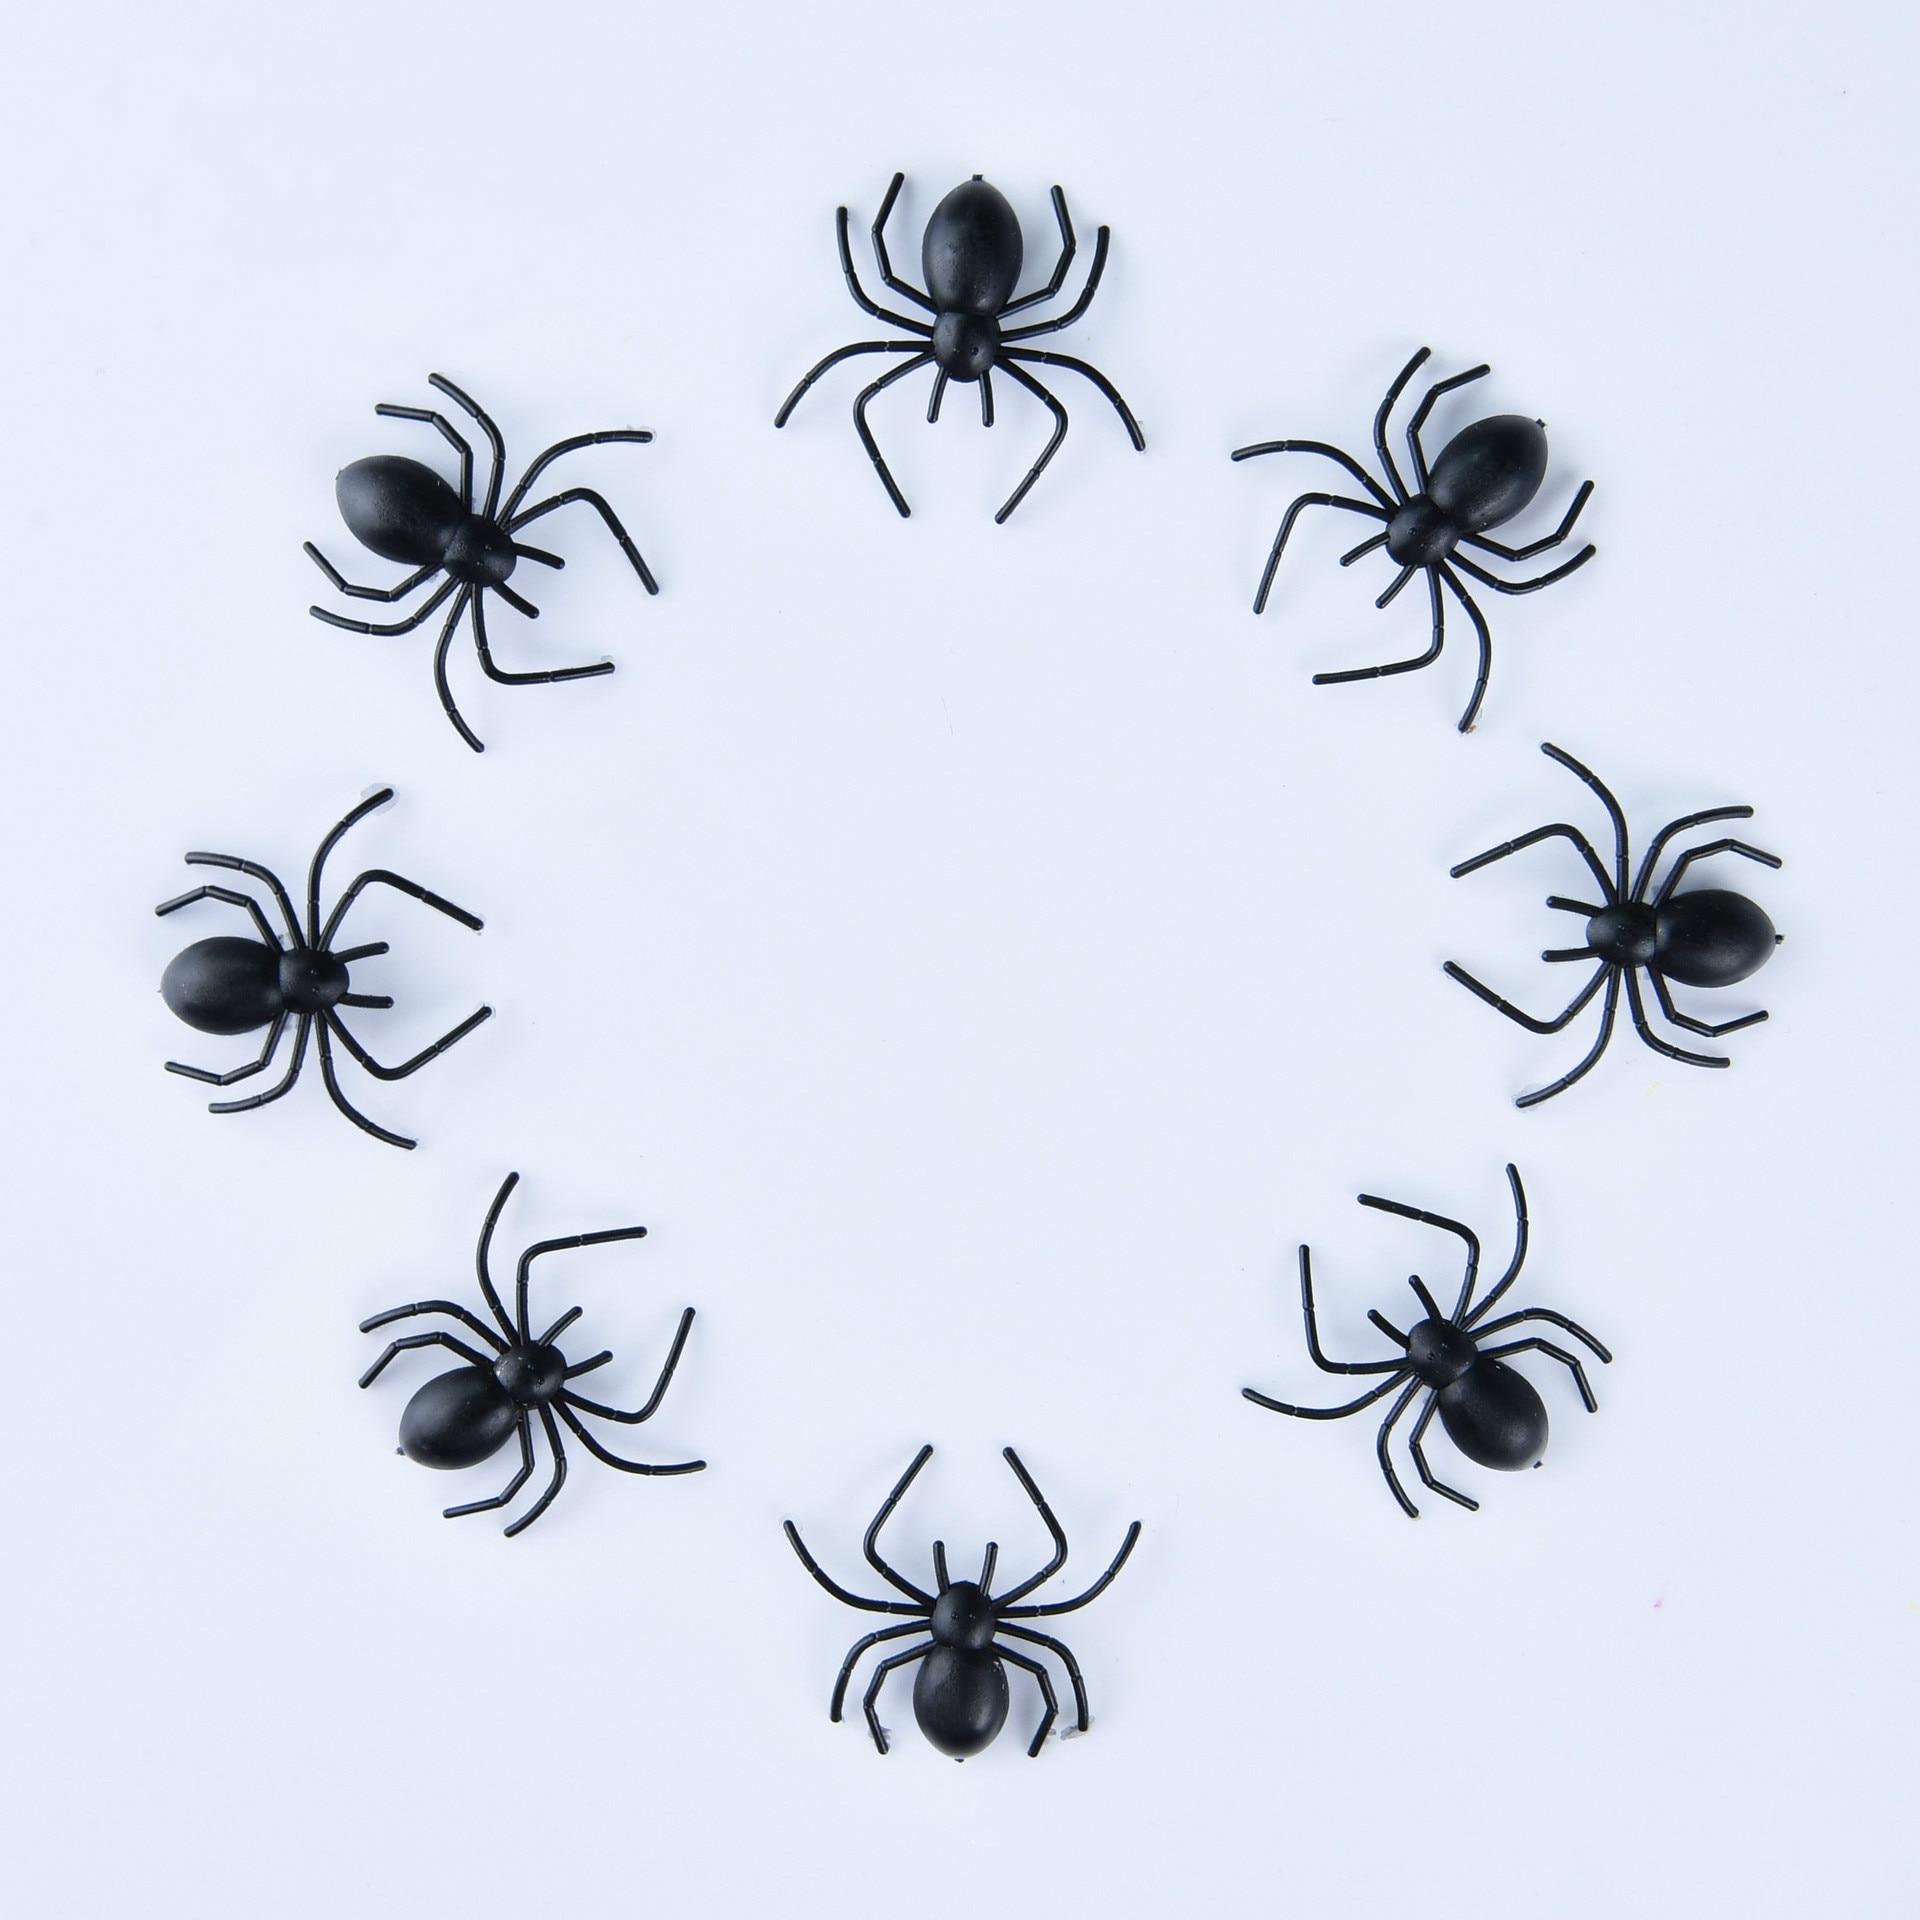 Pack of 300 Flies Halloween Joking Bugs Toys Party Favor Bag Prank Prop